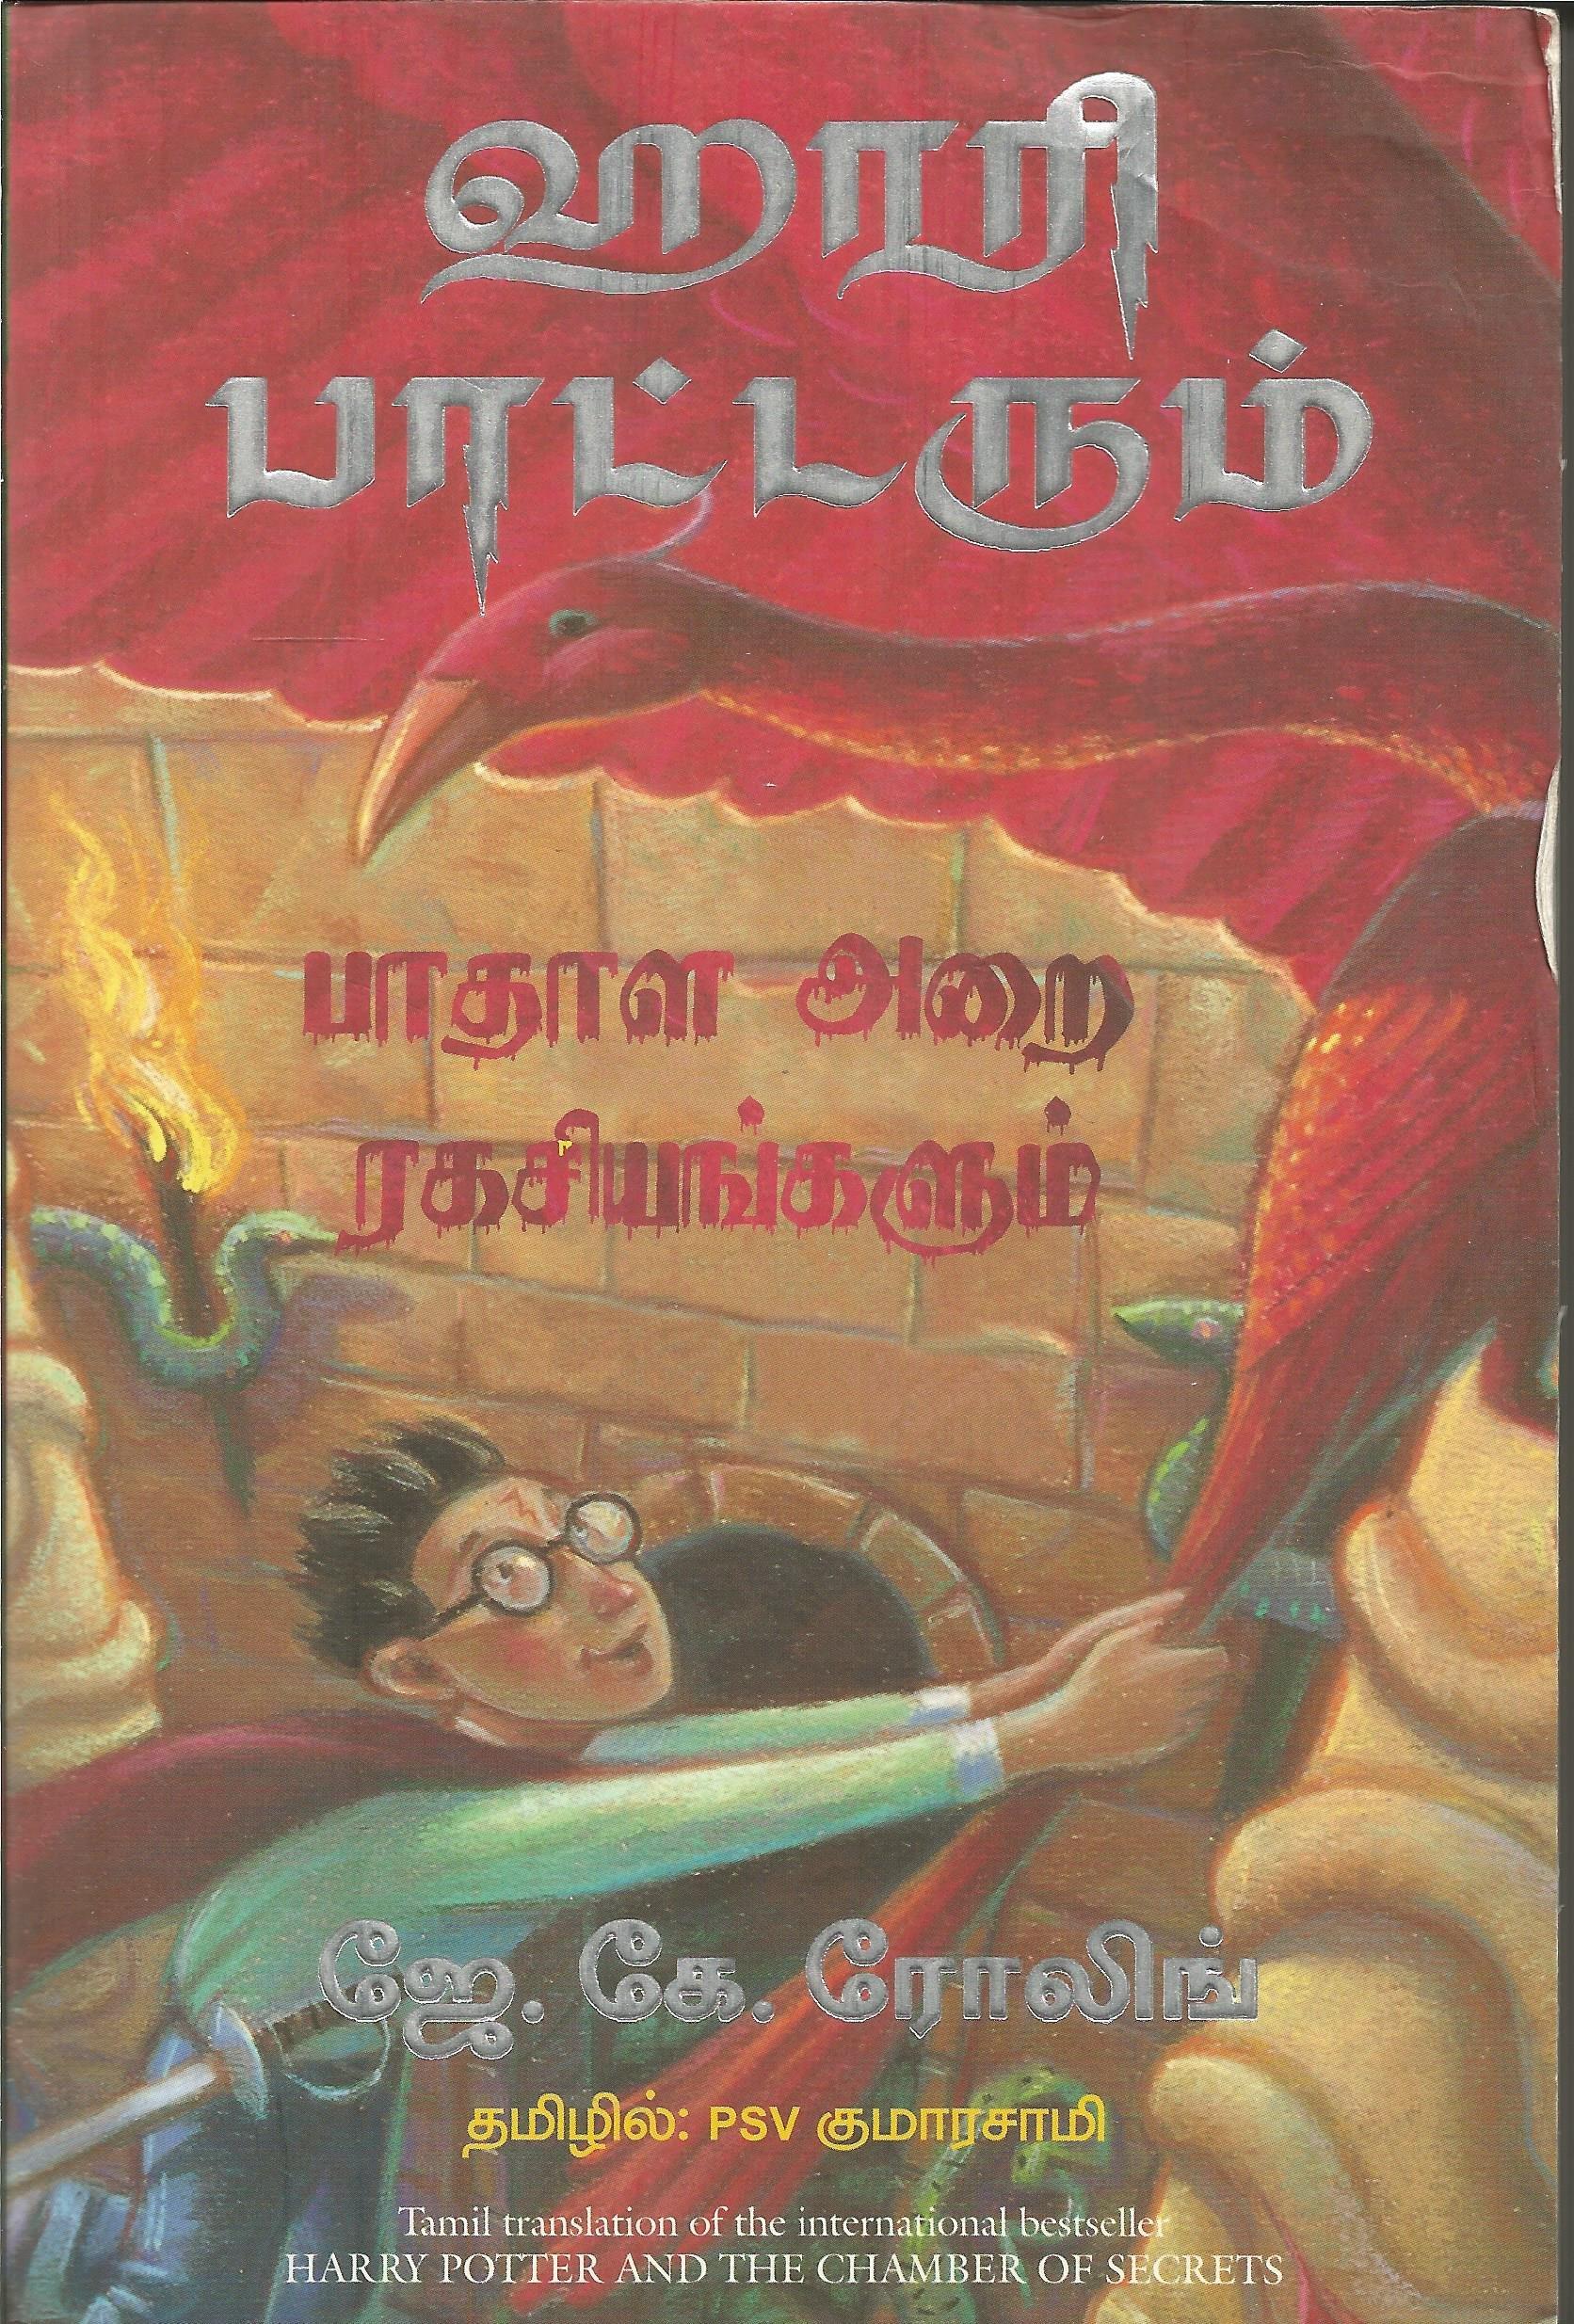 HARRY POTTER AND THE CHAMBER OF SECRETS - Tamil - ஹாரி பாட்டரும் பாதாள அறை ரகசியங்களும்